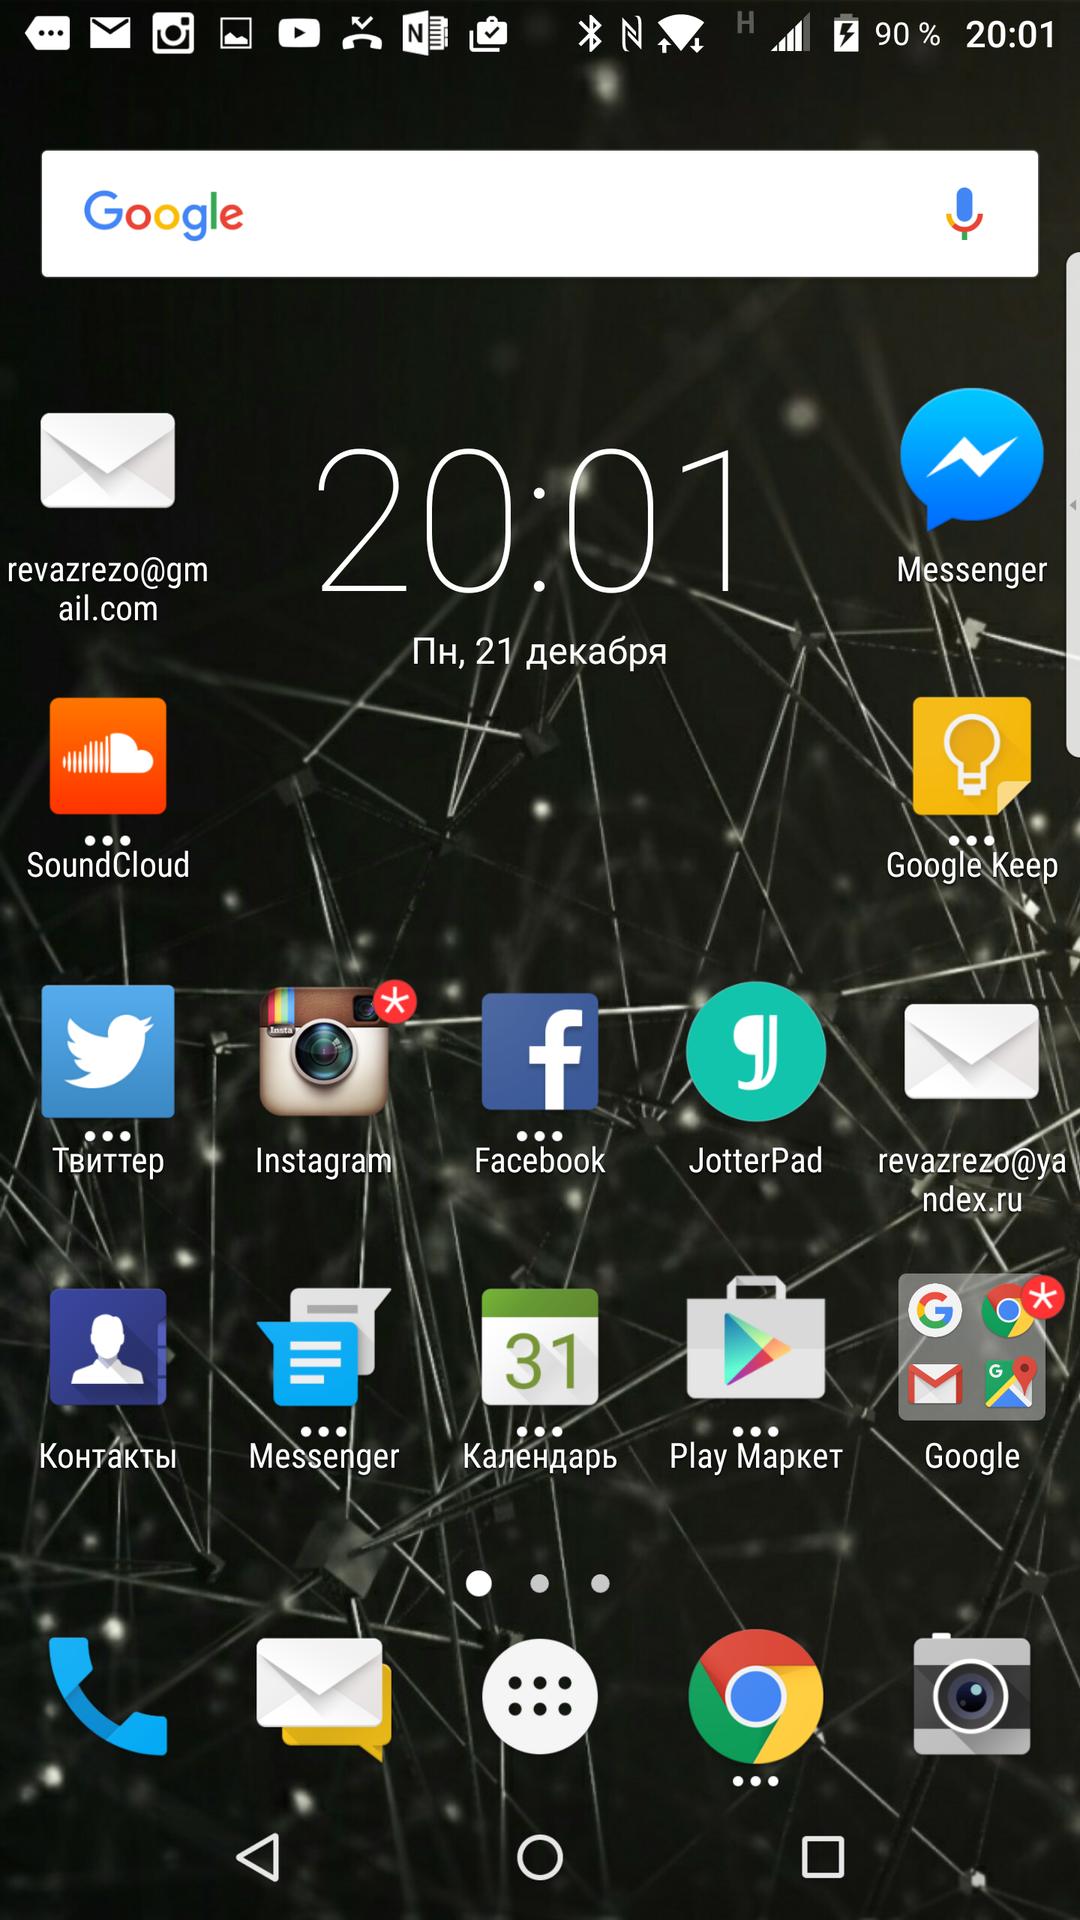 screenshot2015-12-21-20-01-22-1080x1920